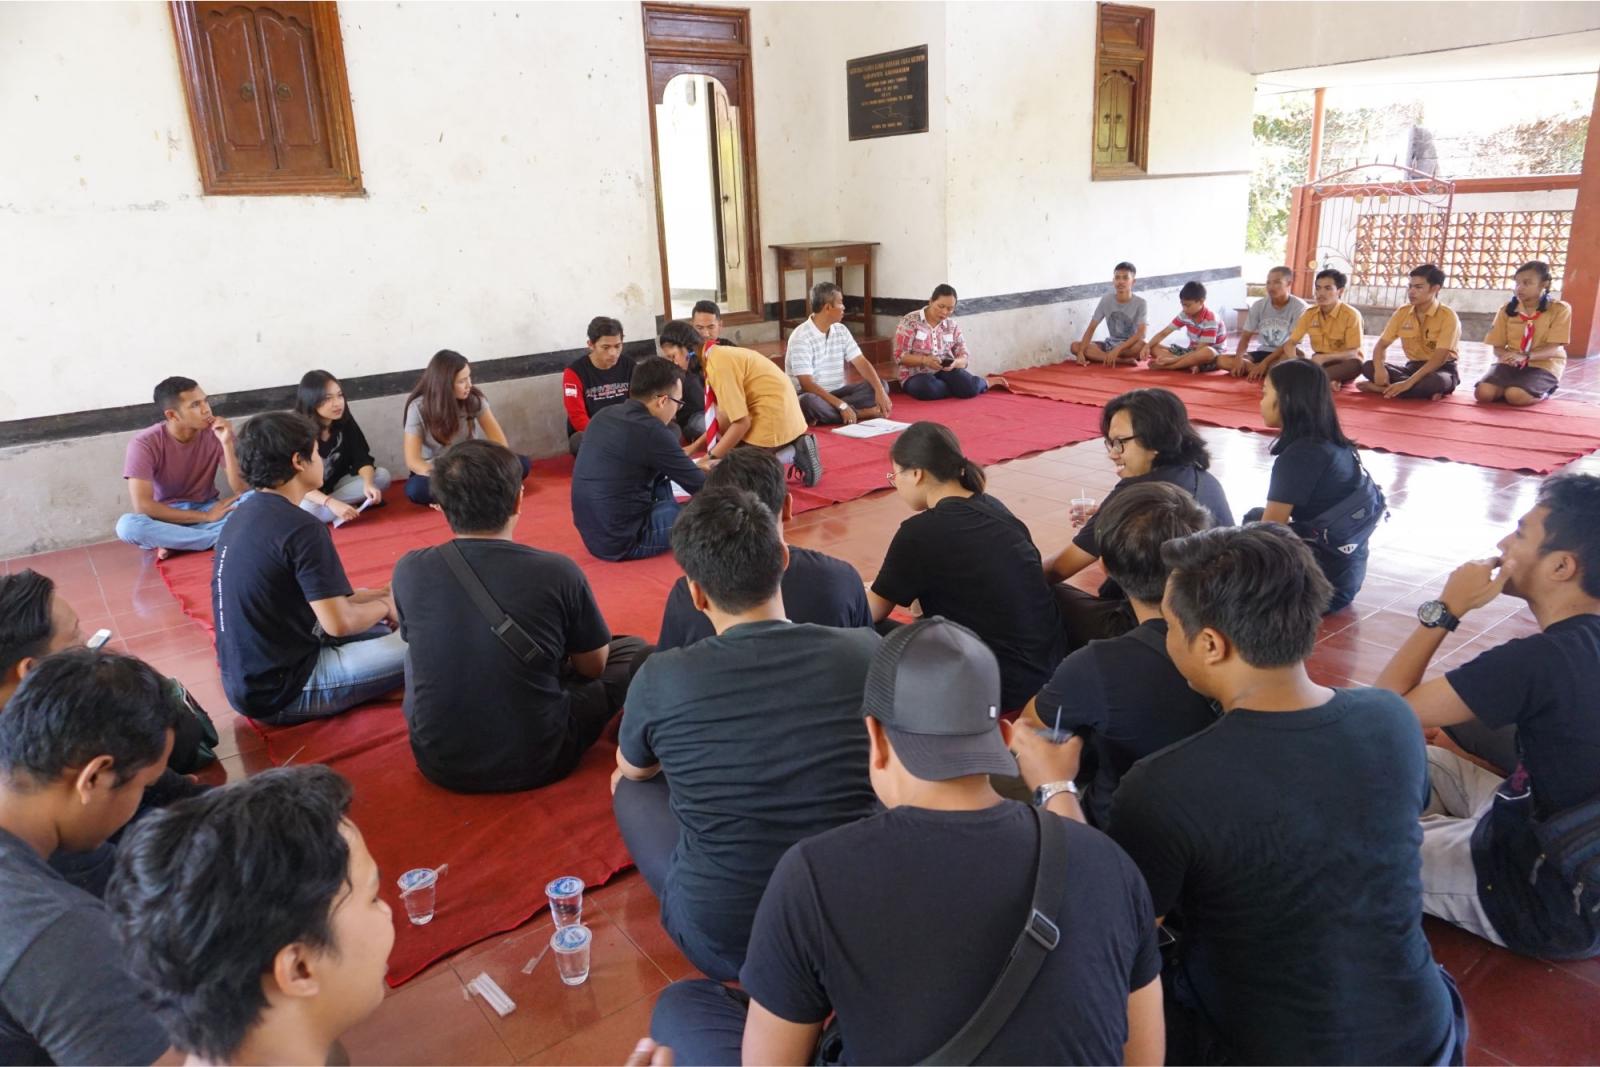 Bali Emporio Architect Team Conducts Charity Activities to Yasa Kerti Karangasem Orphanage Foundatio 9